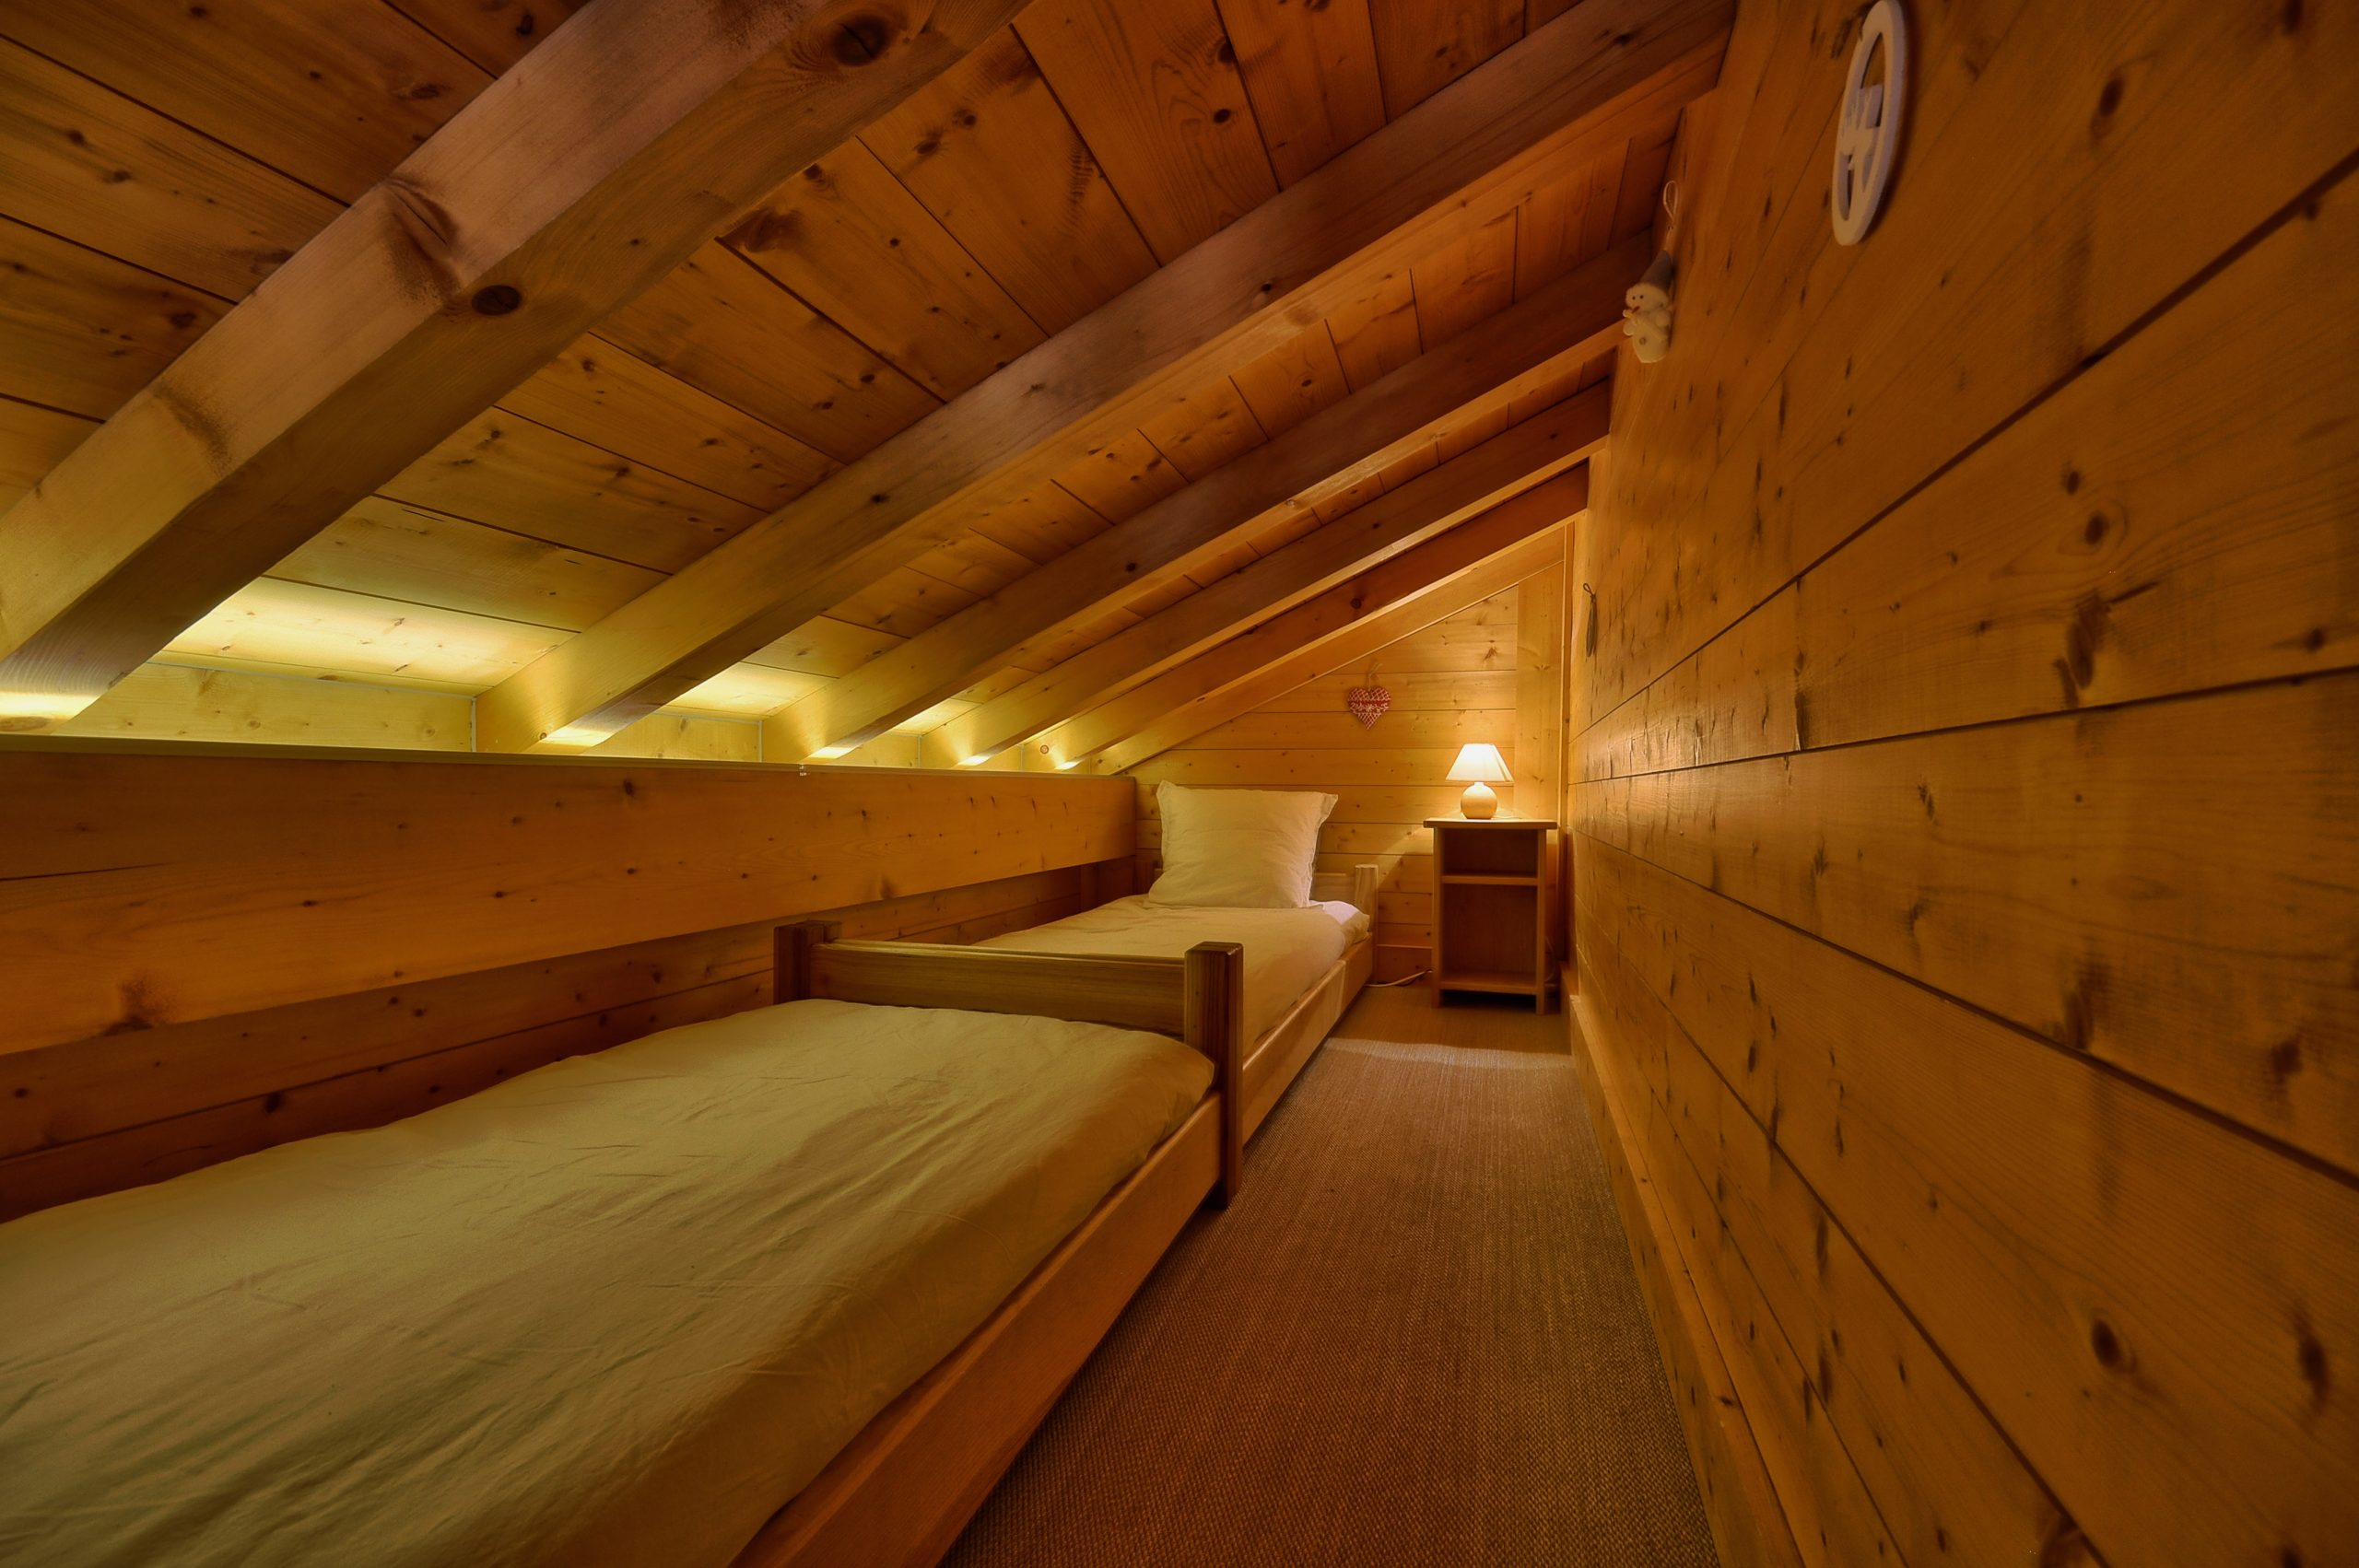 Marmotte - Mezzanine de la Chambre 3